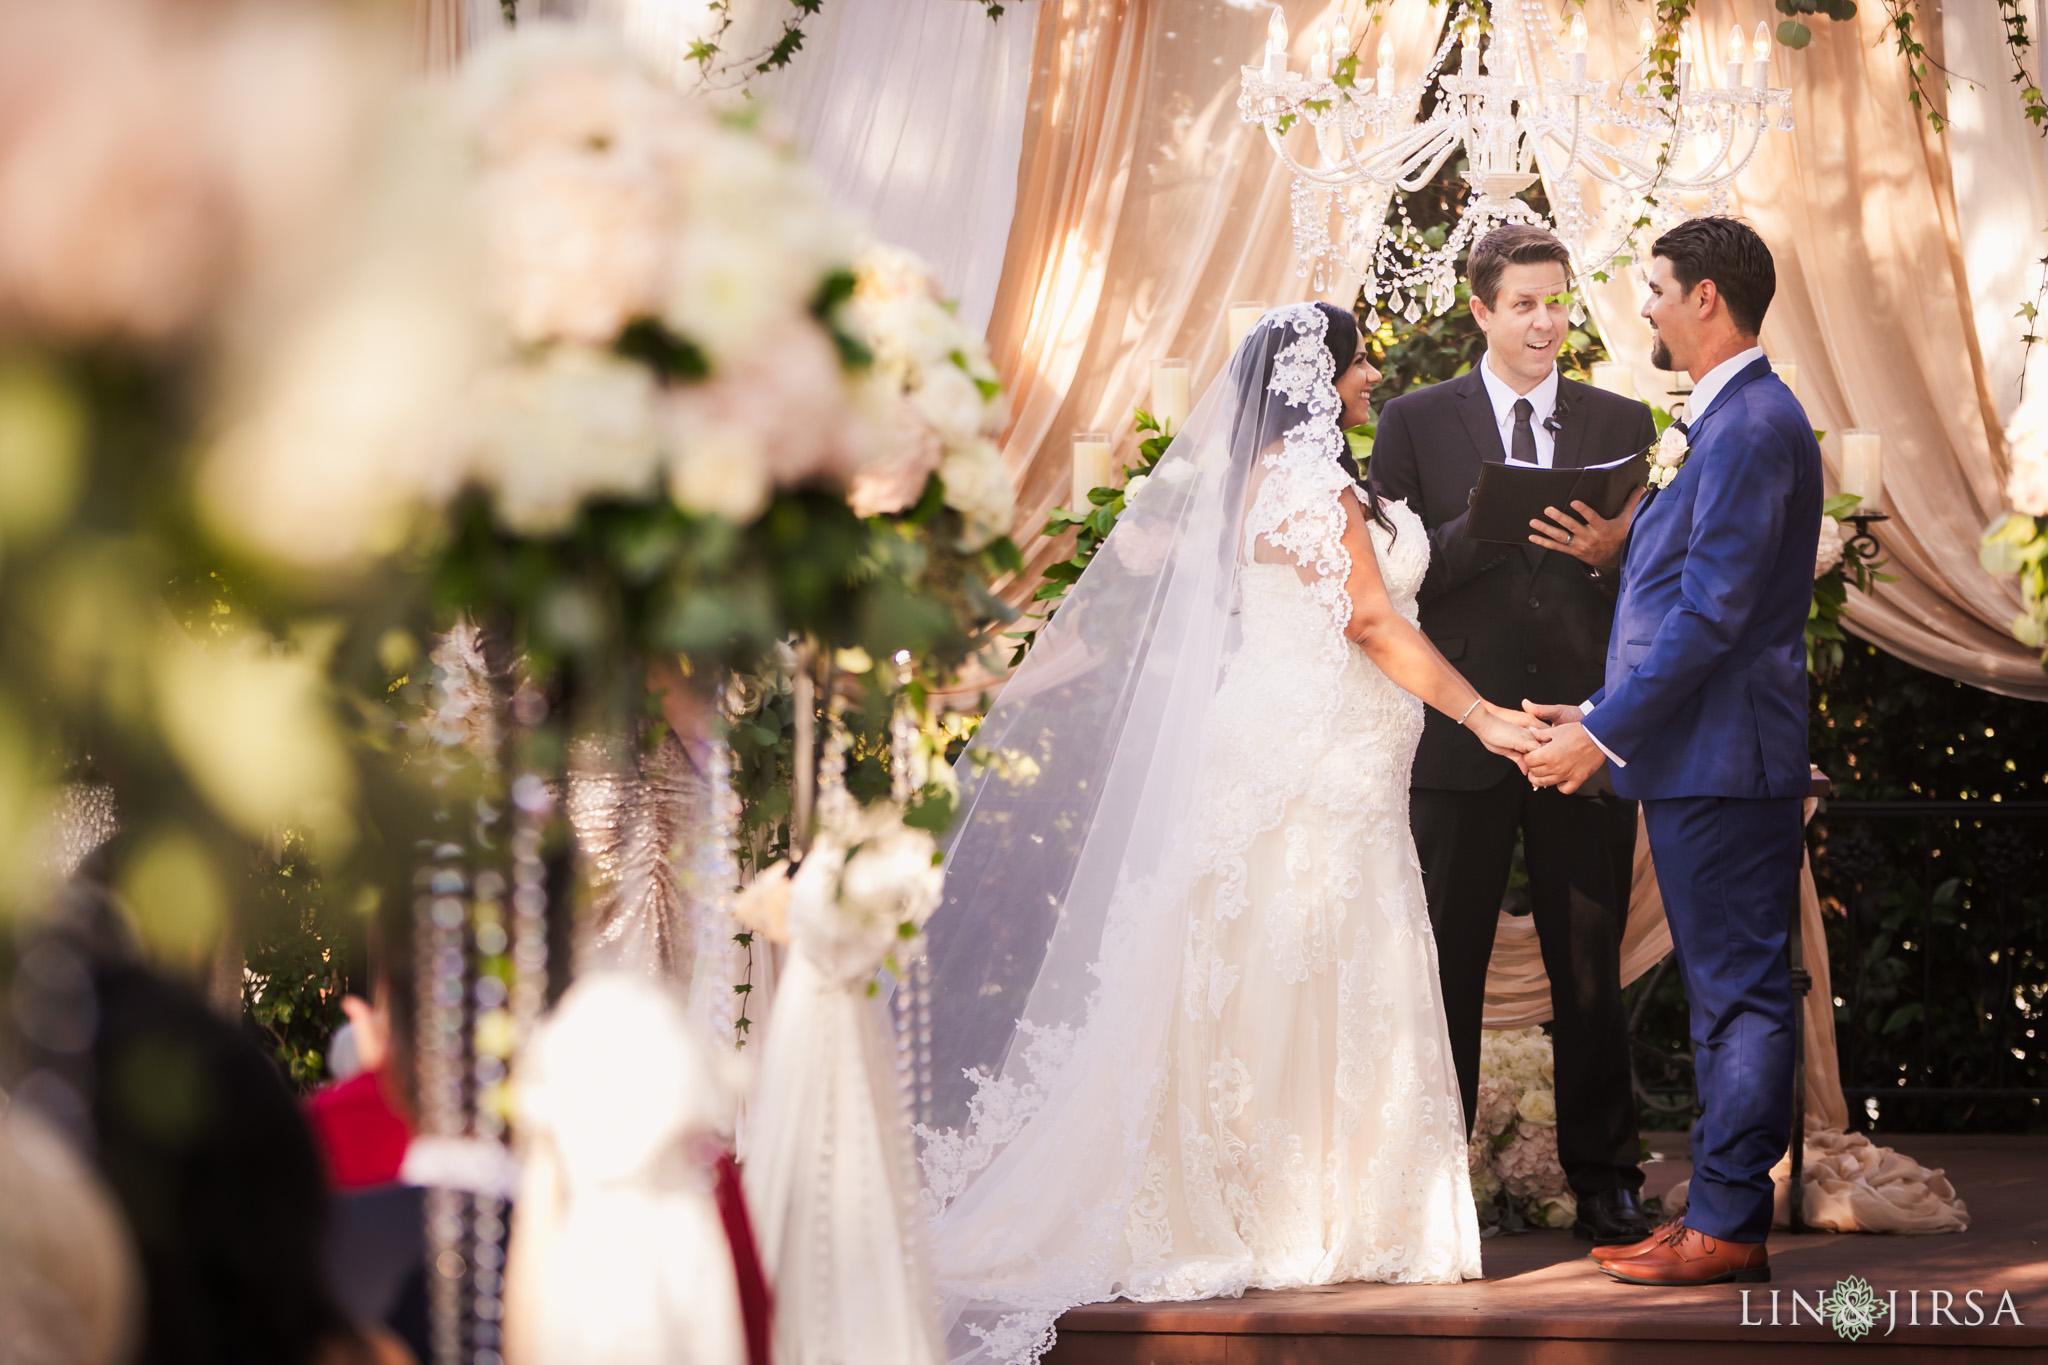 014 padua hills claremont wedding ceremony photography